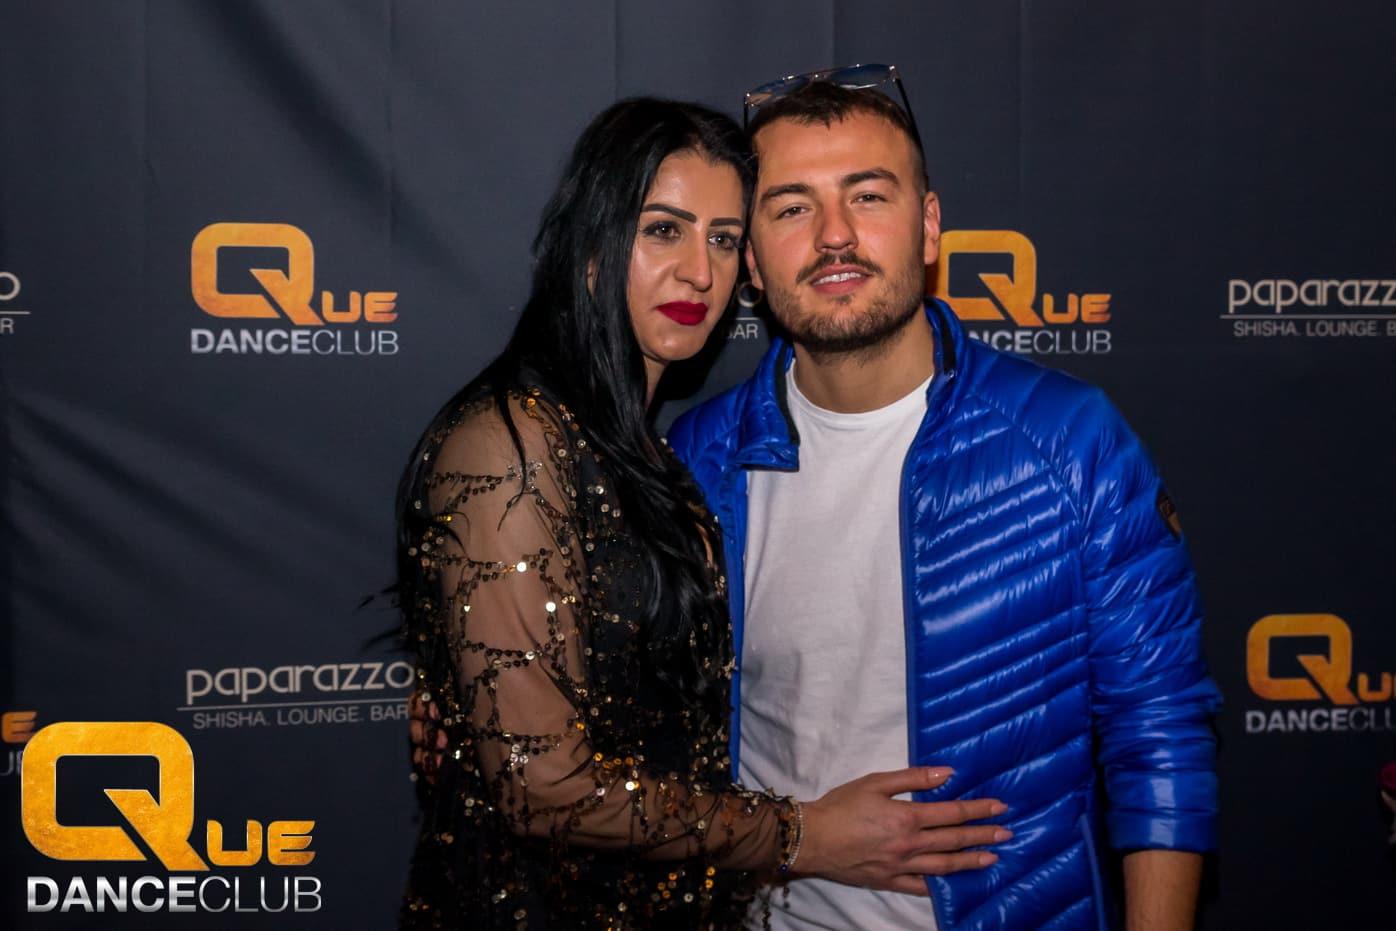 2018_12_08_Que_Danceclub_Paparazzo_Night_Ardian_Bujupi_Live_Nightlife_Scene_Timo_074